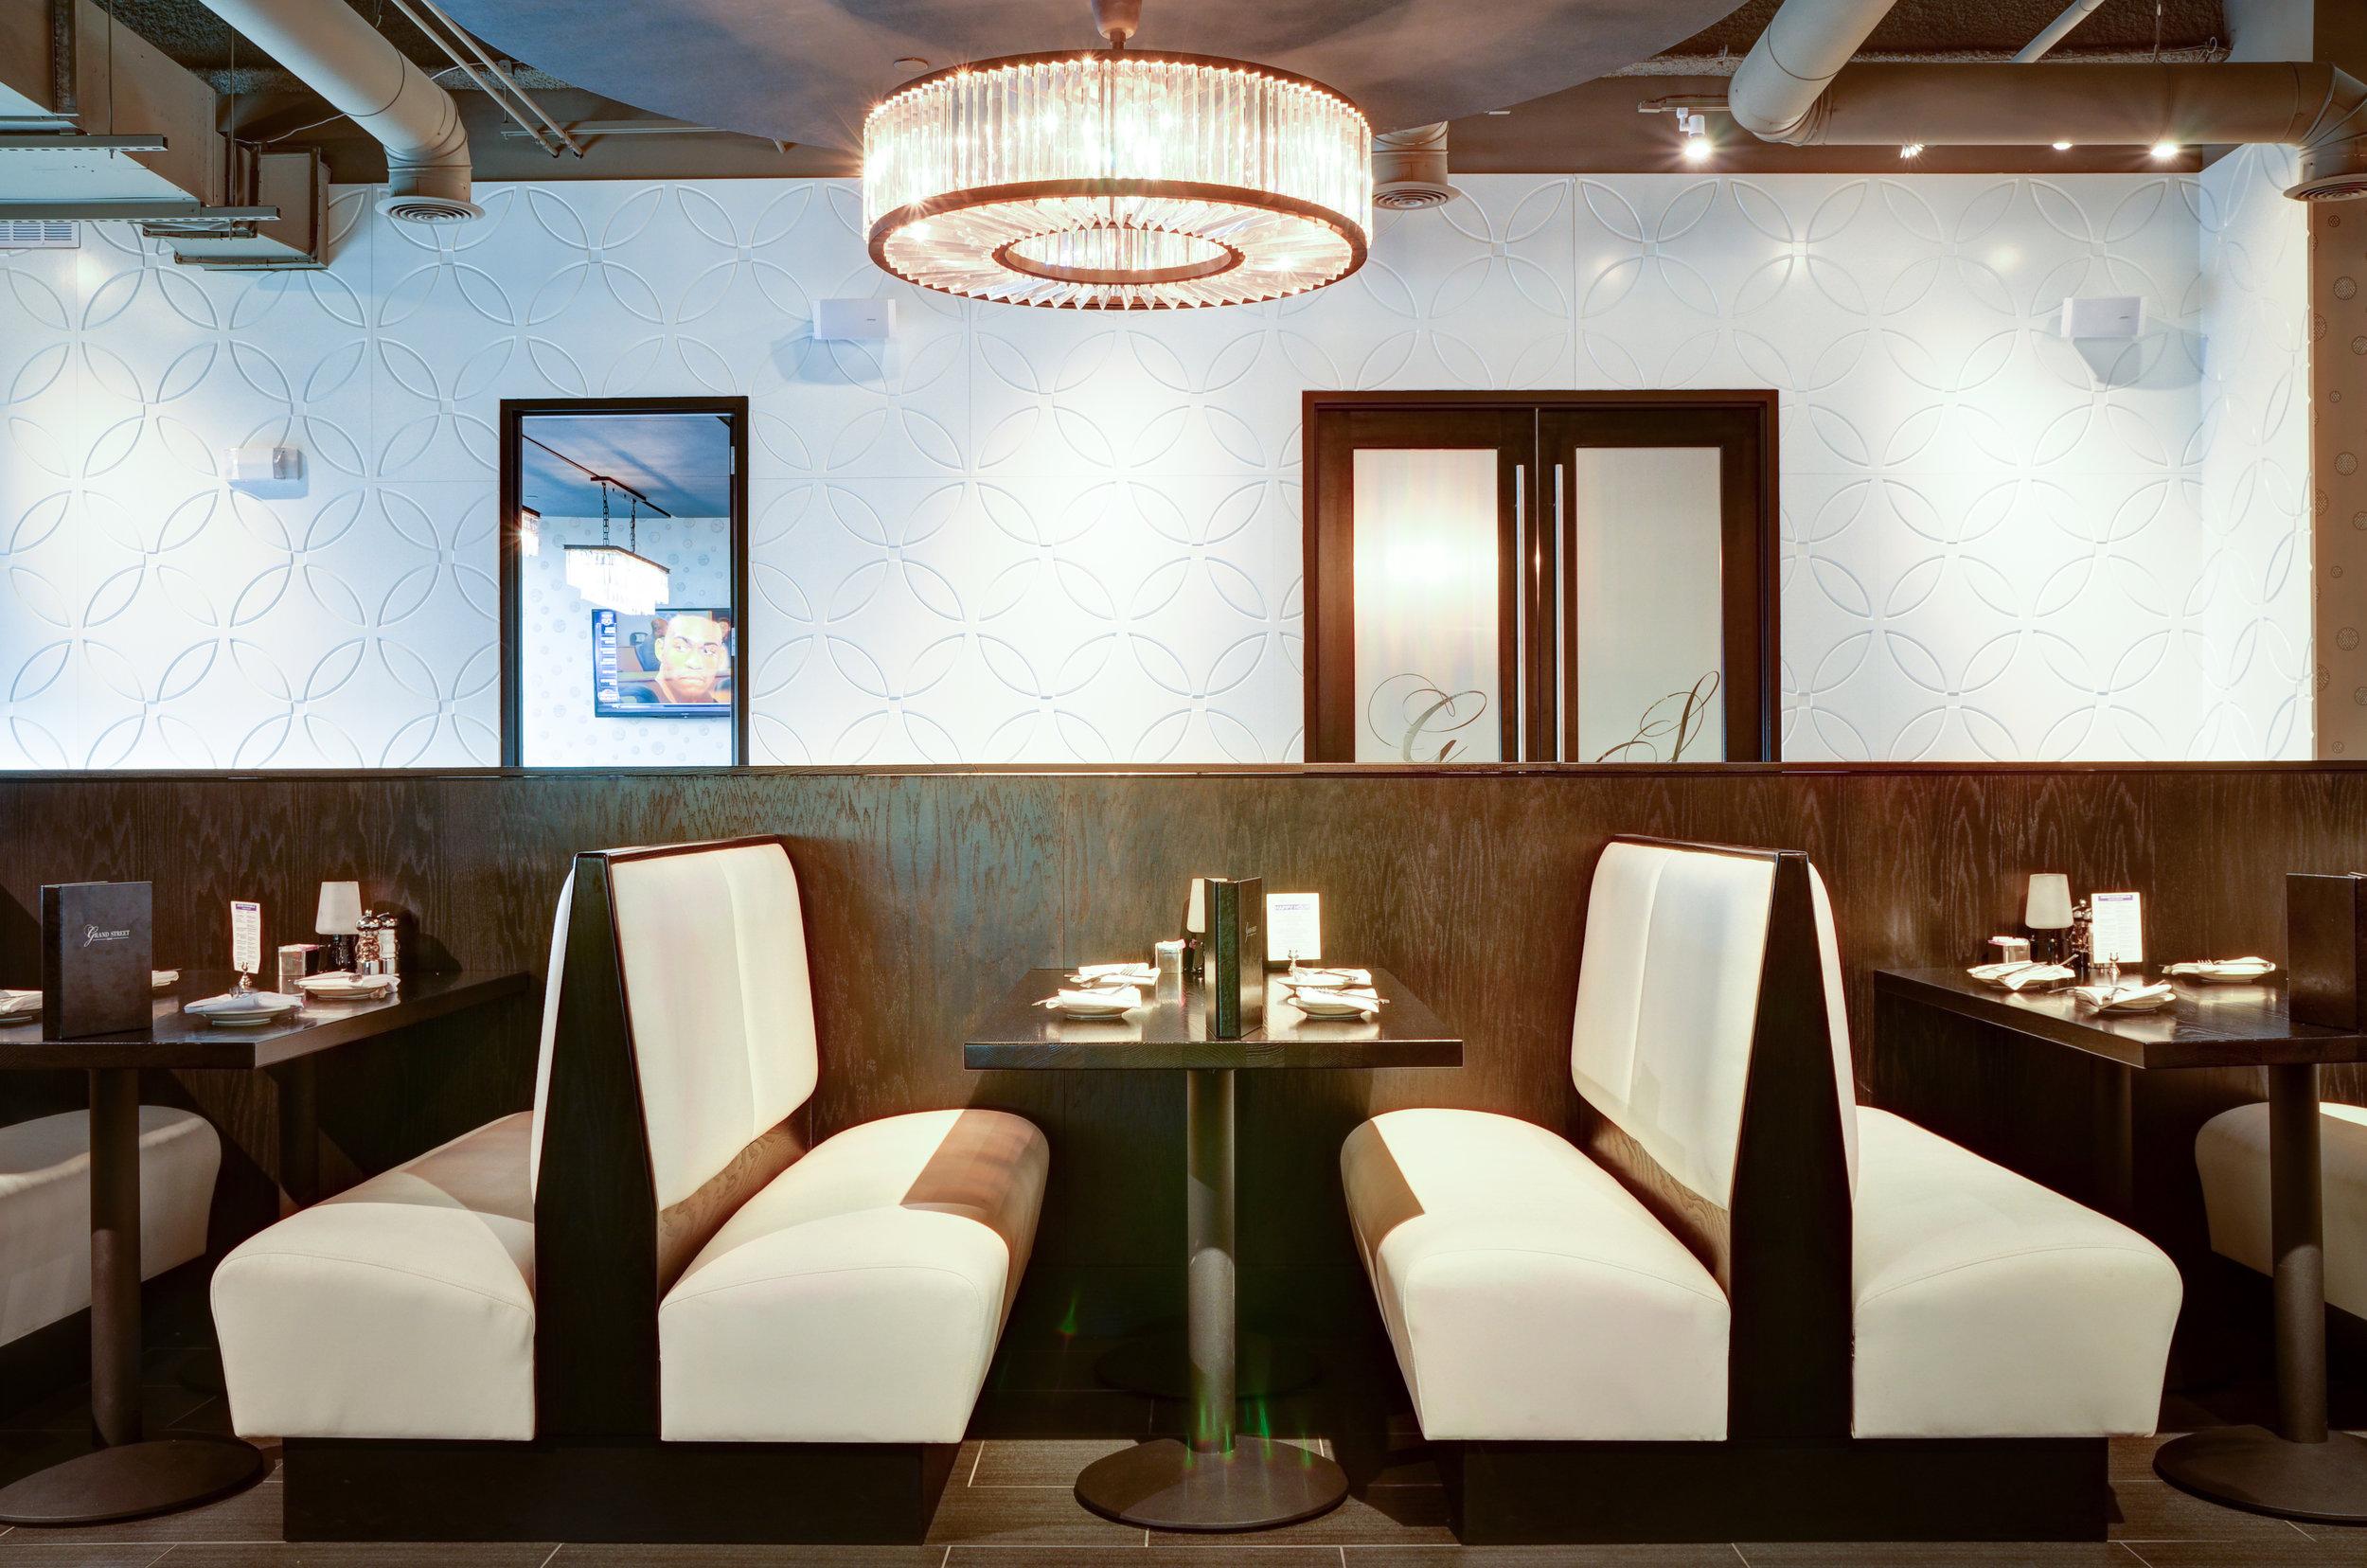 20131219-Grand Street Cafe-0018.jpg